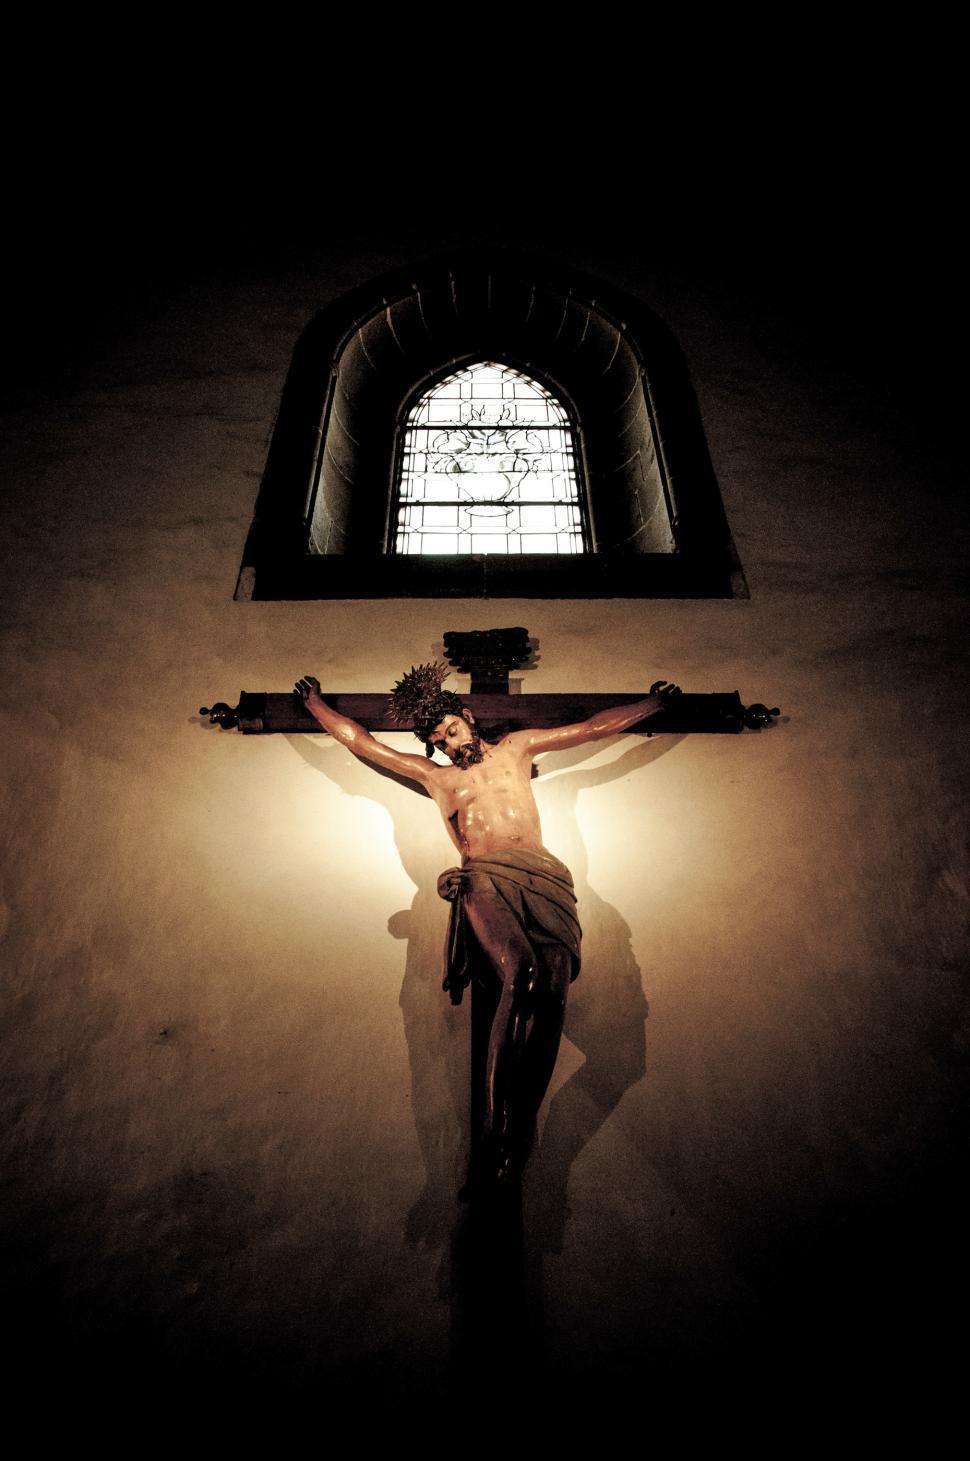 Download Free Stock HD Photo of Jesus on cross Online